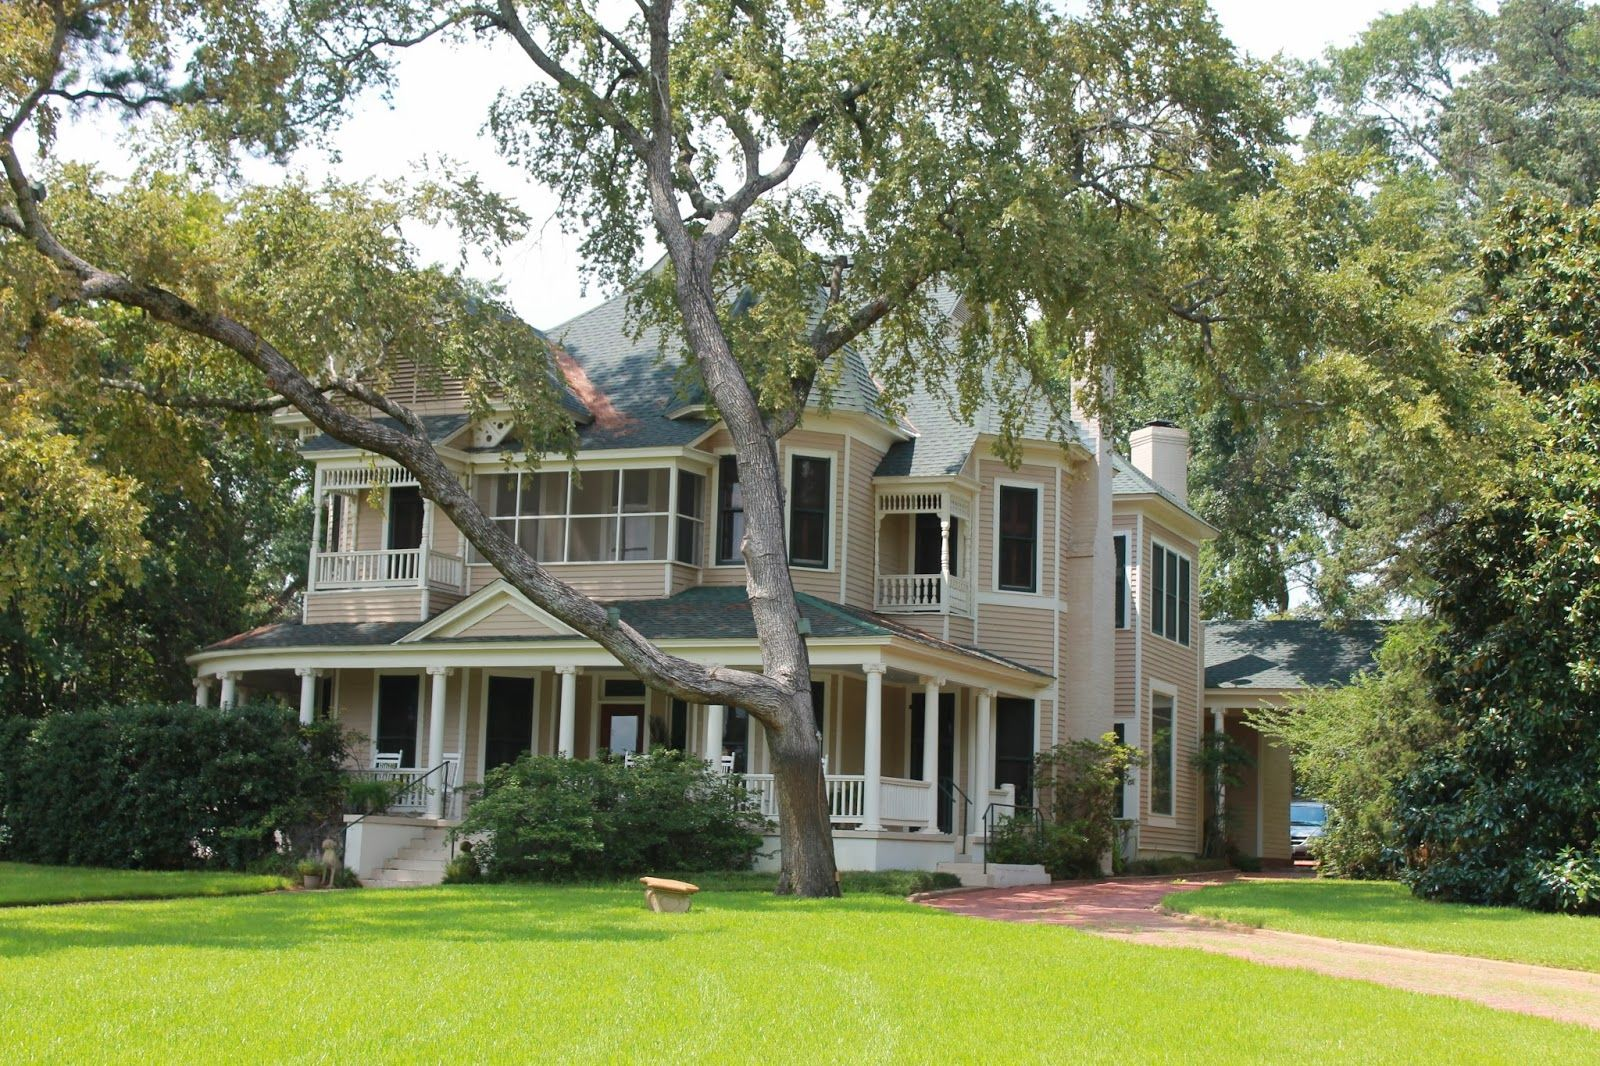 historic home in palestine texas lone star historian 2 january rh pinterest com